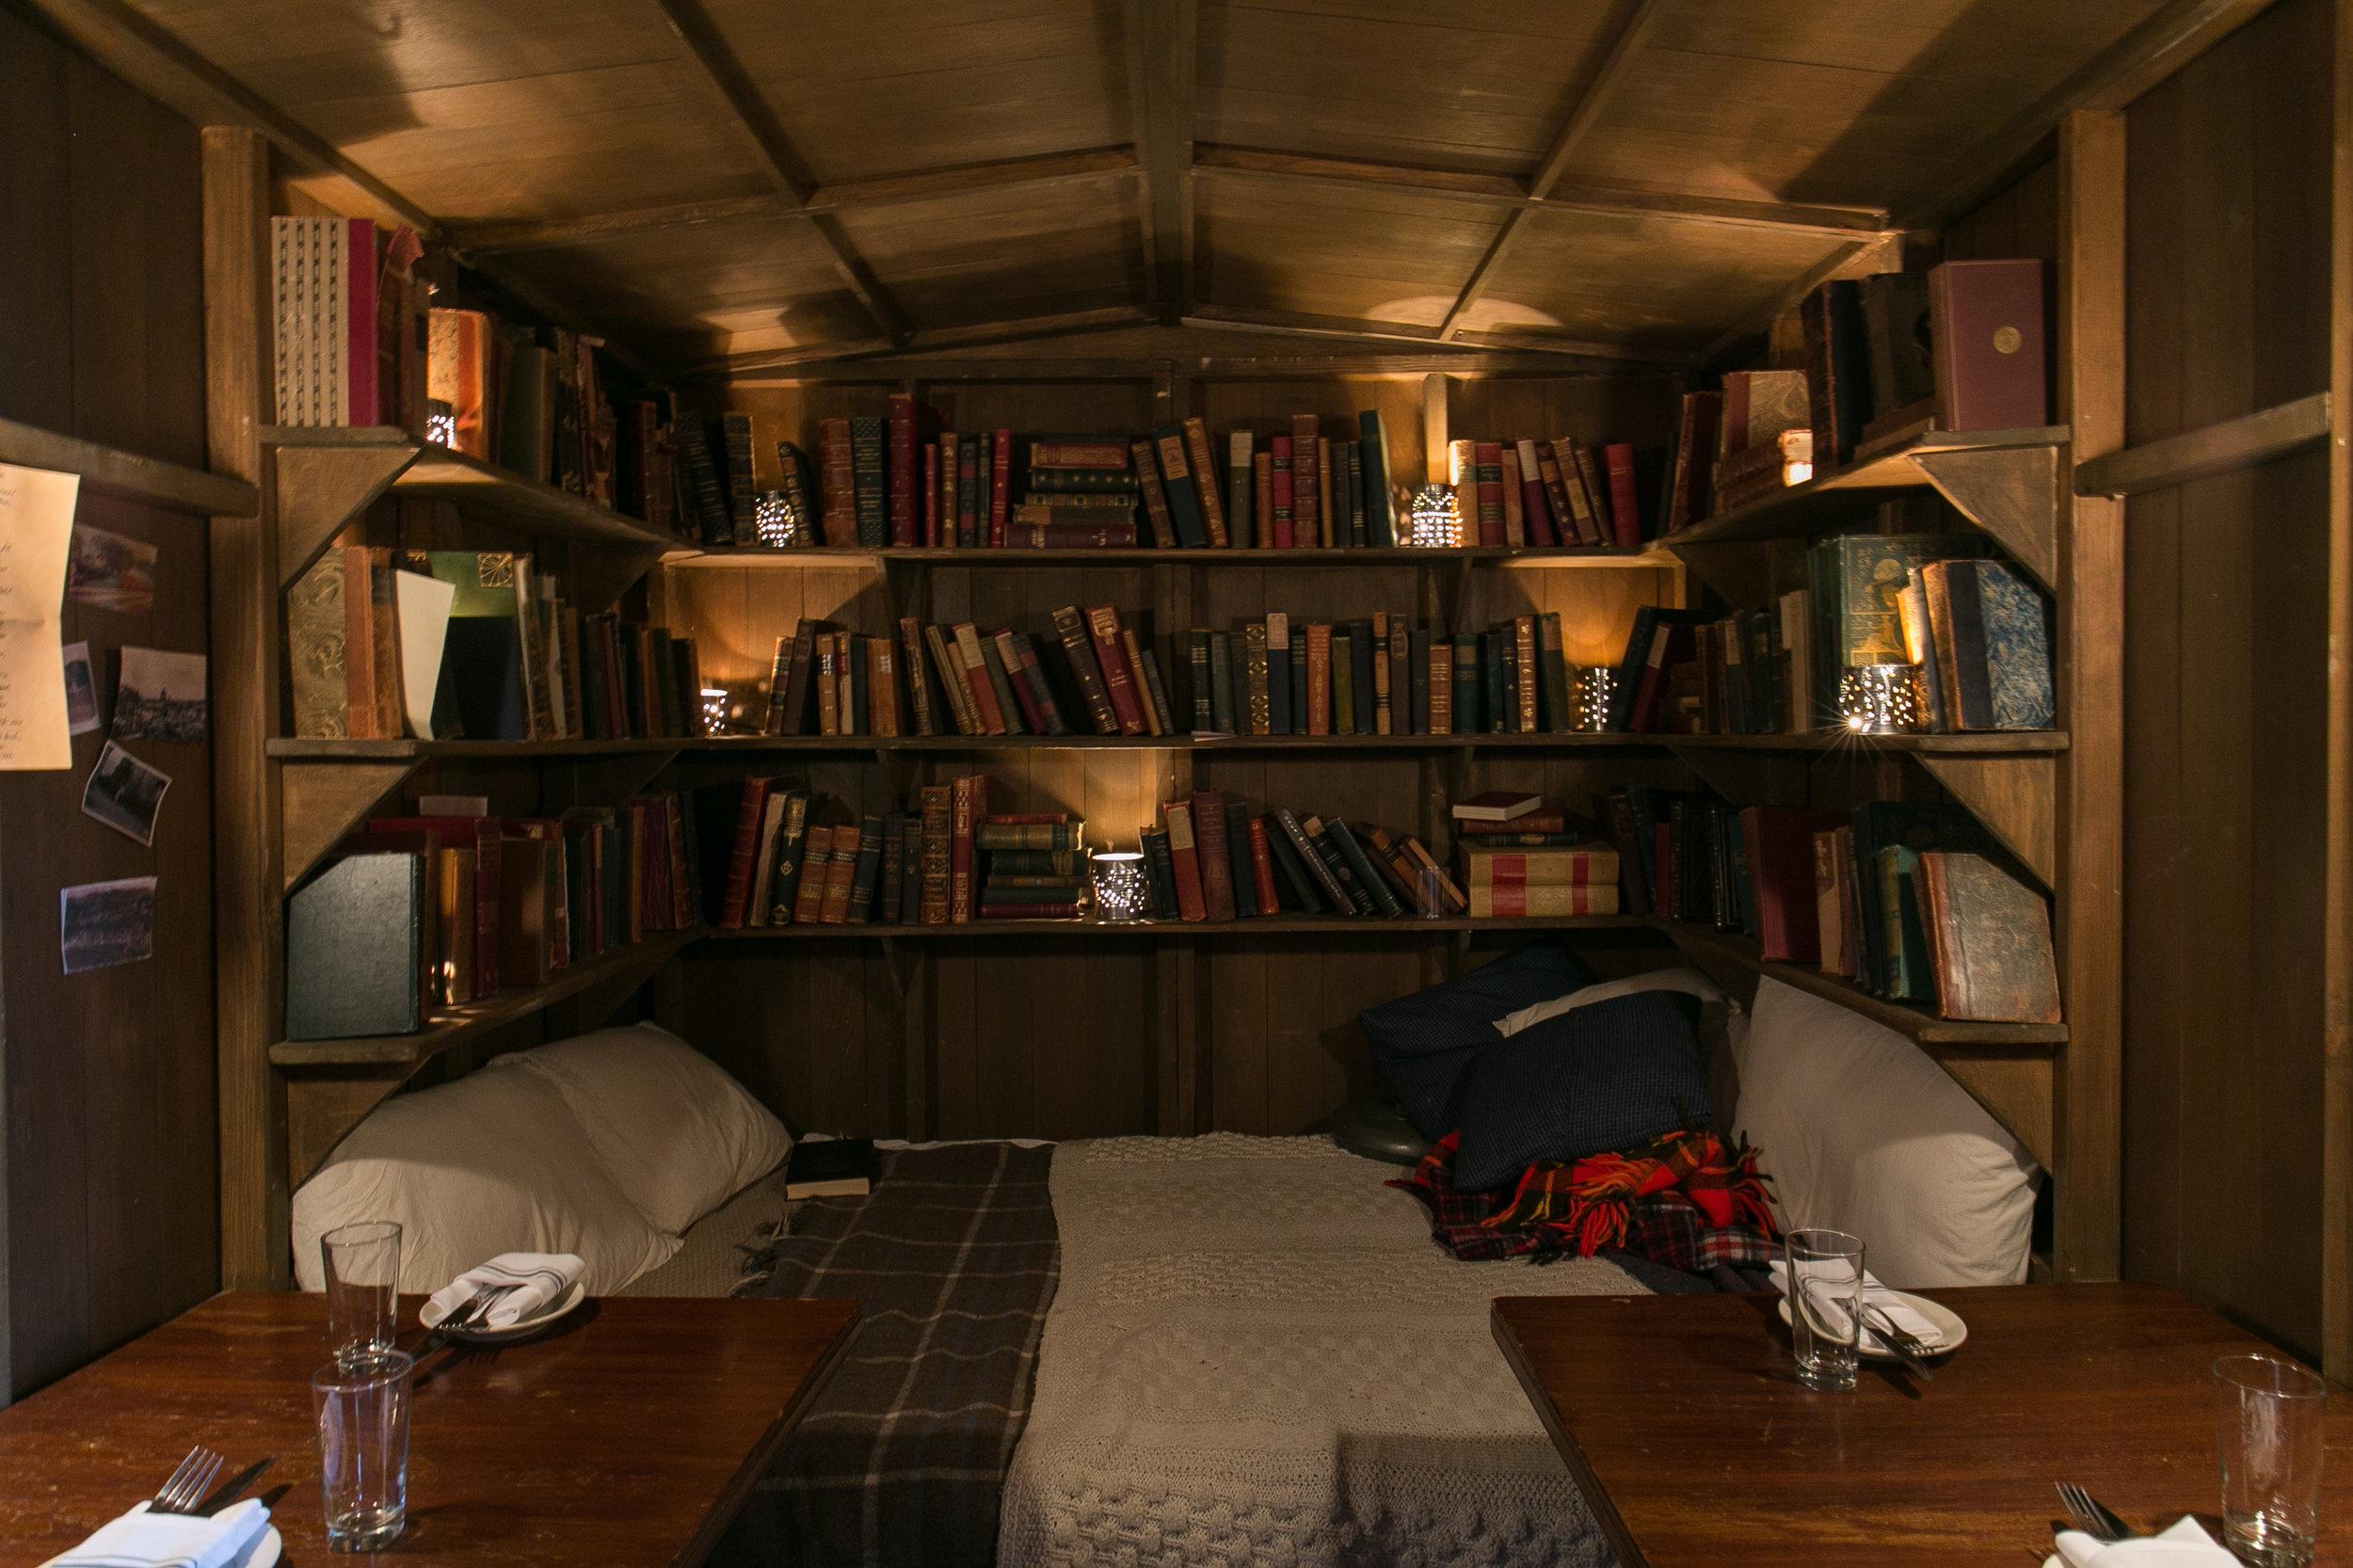 The-Lodge-Bedroom_Conor-Harrigan.jpg